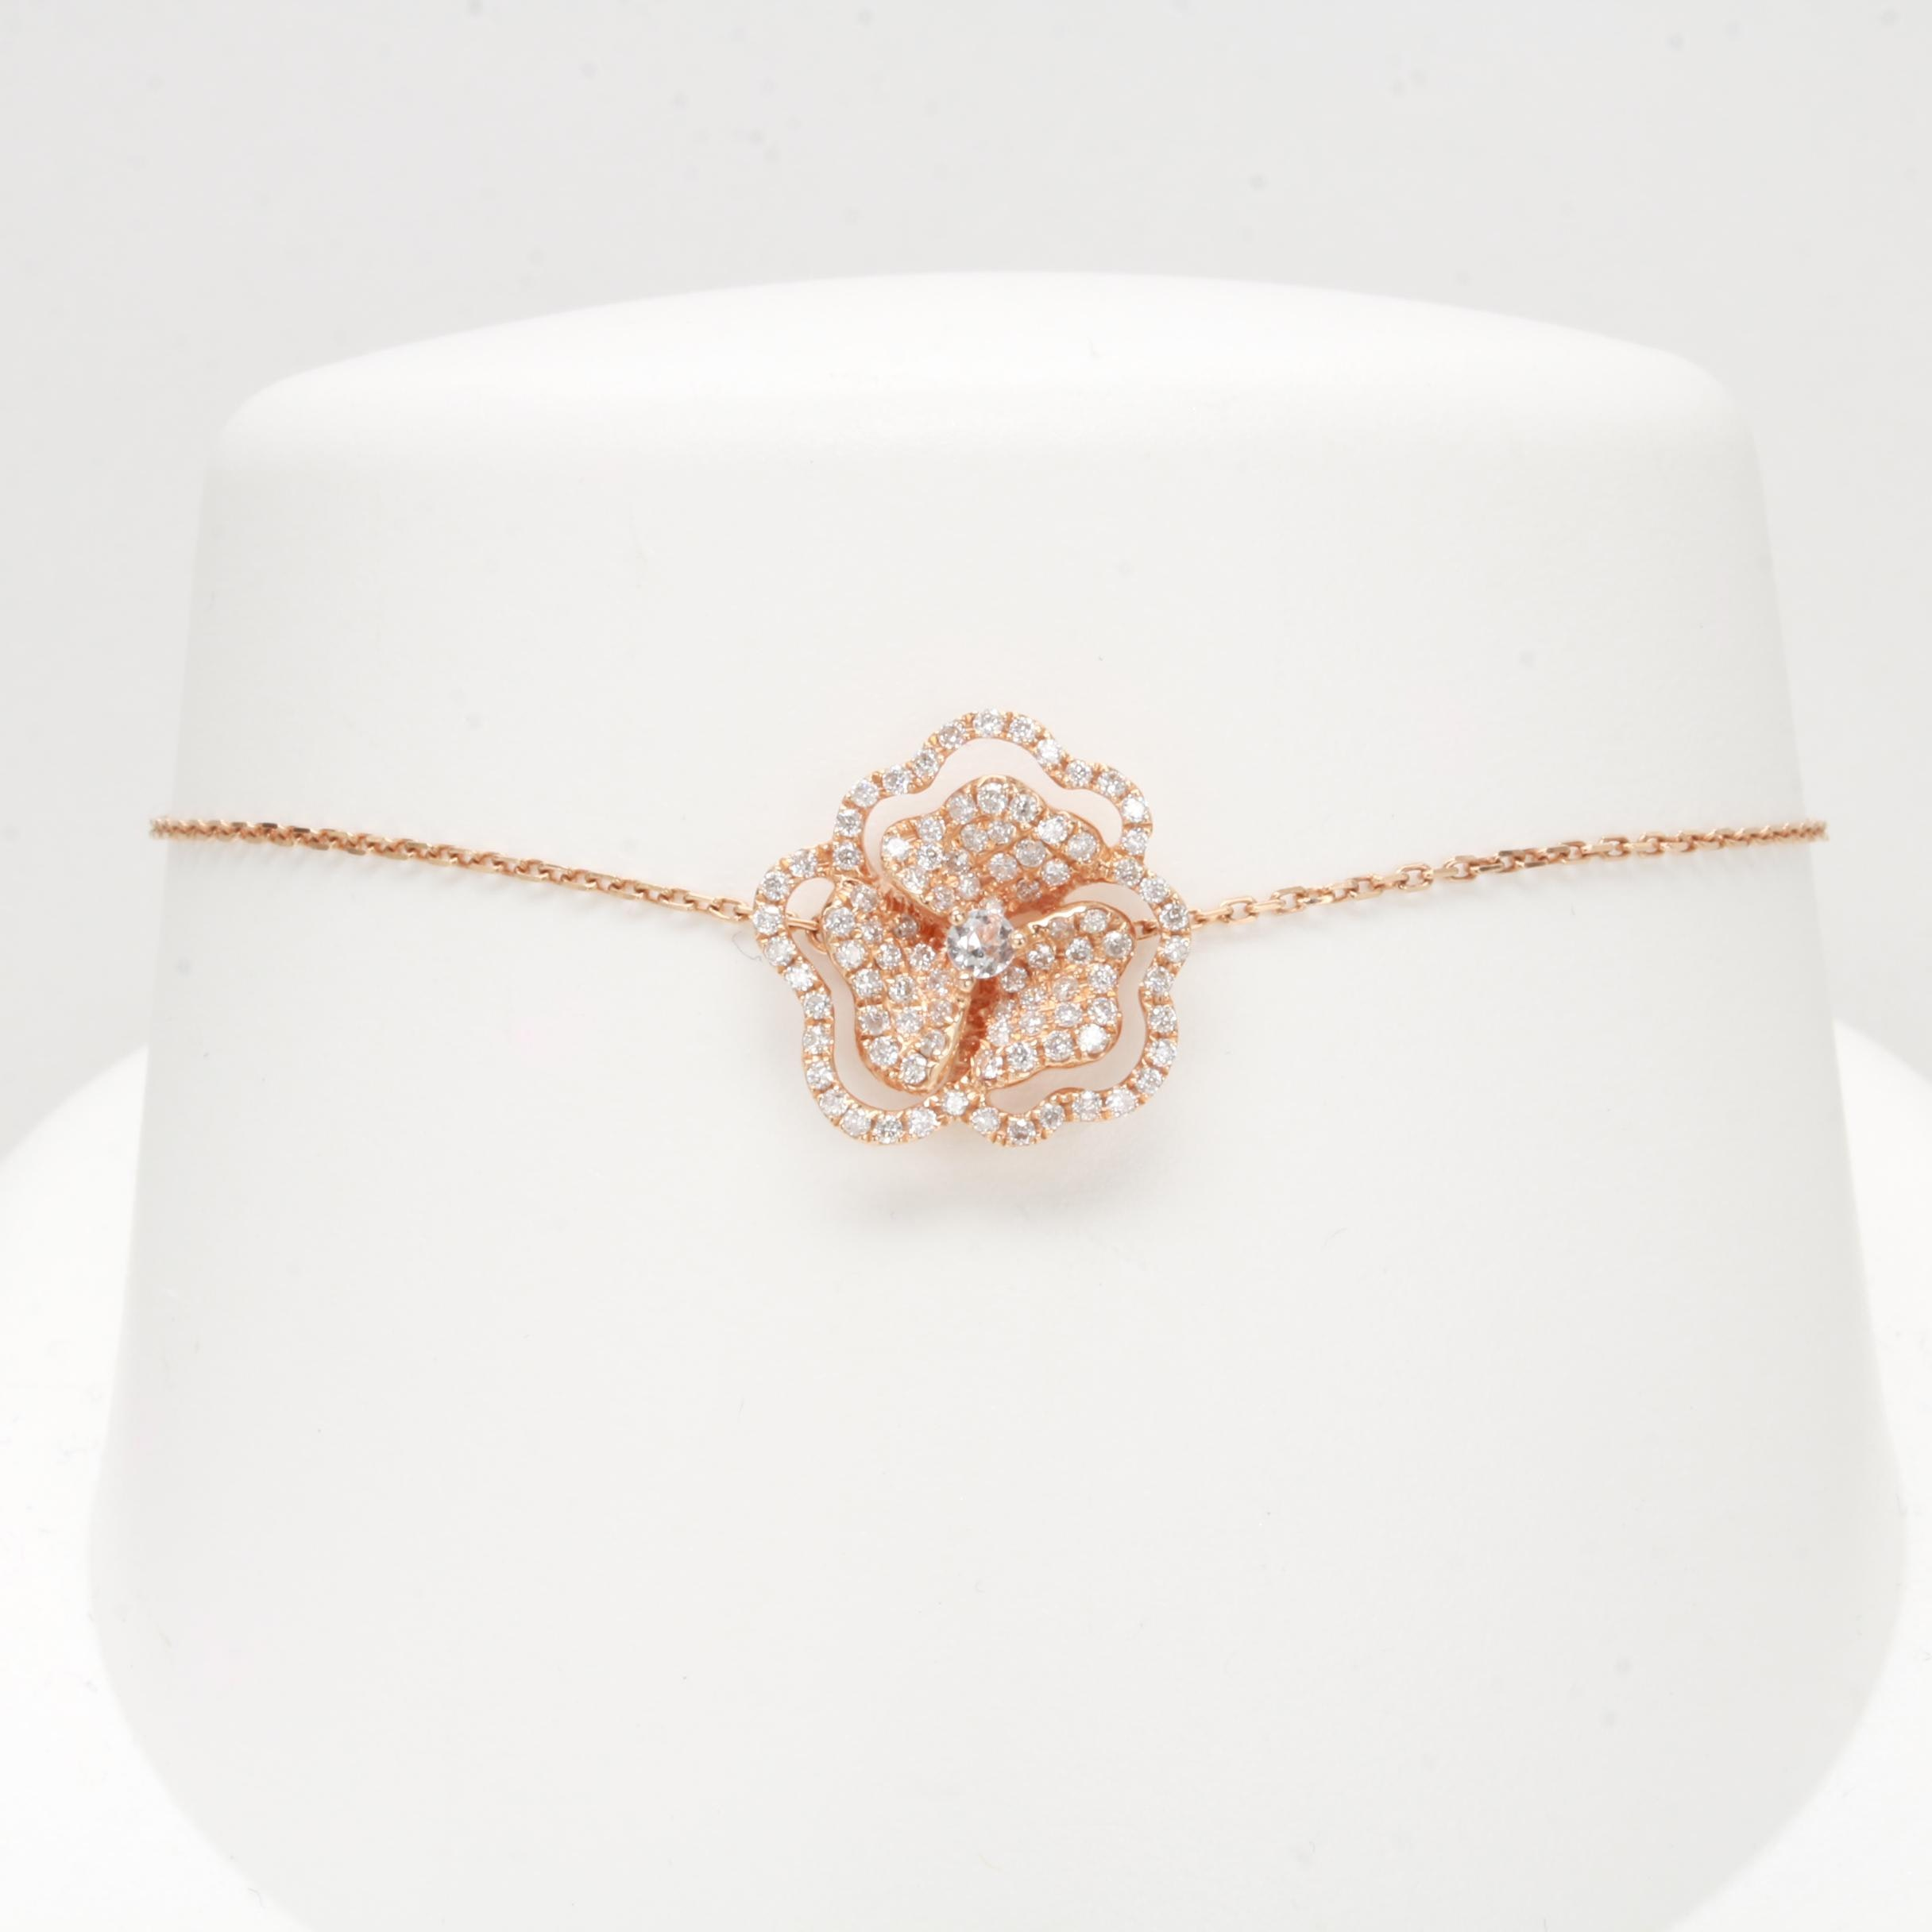 18K Rose Gold Diamond and White Sapphire Bracelet